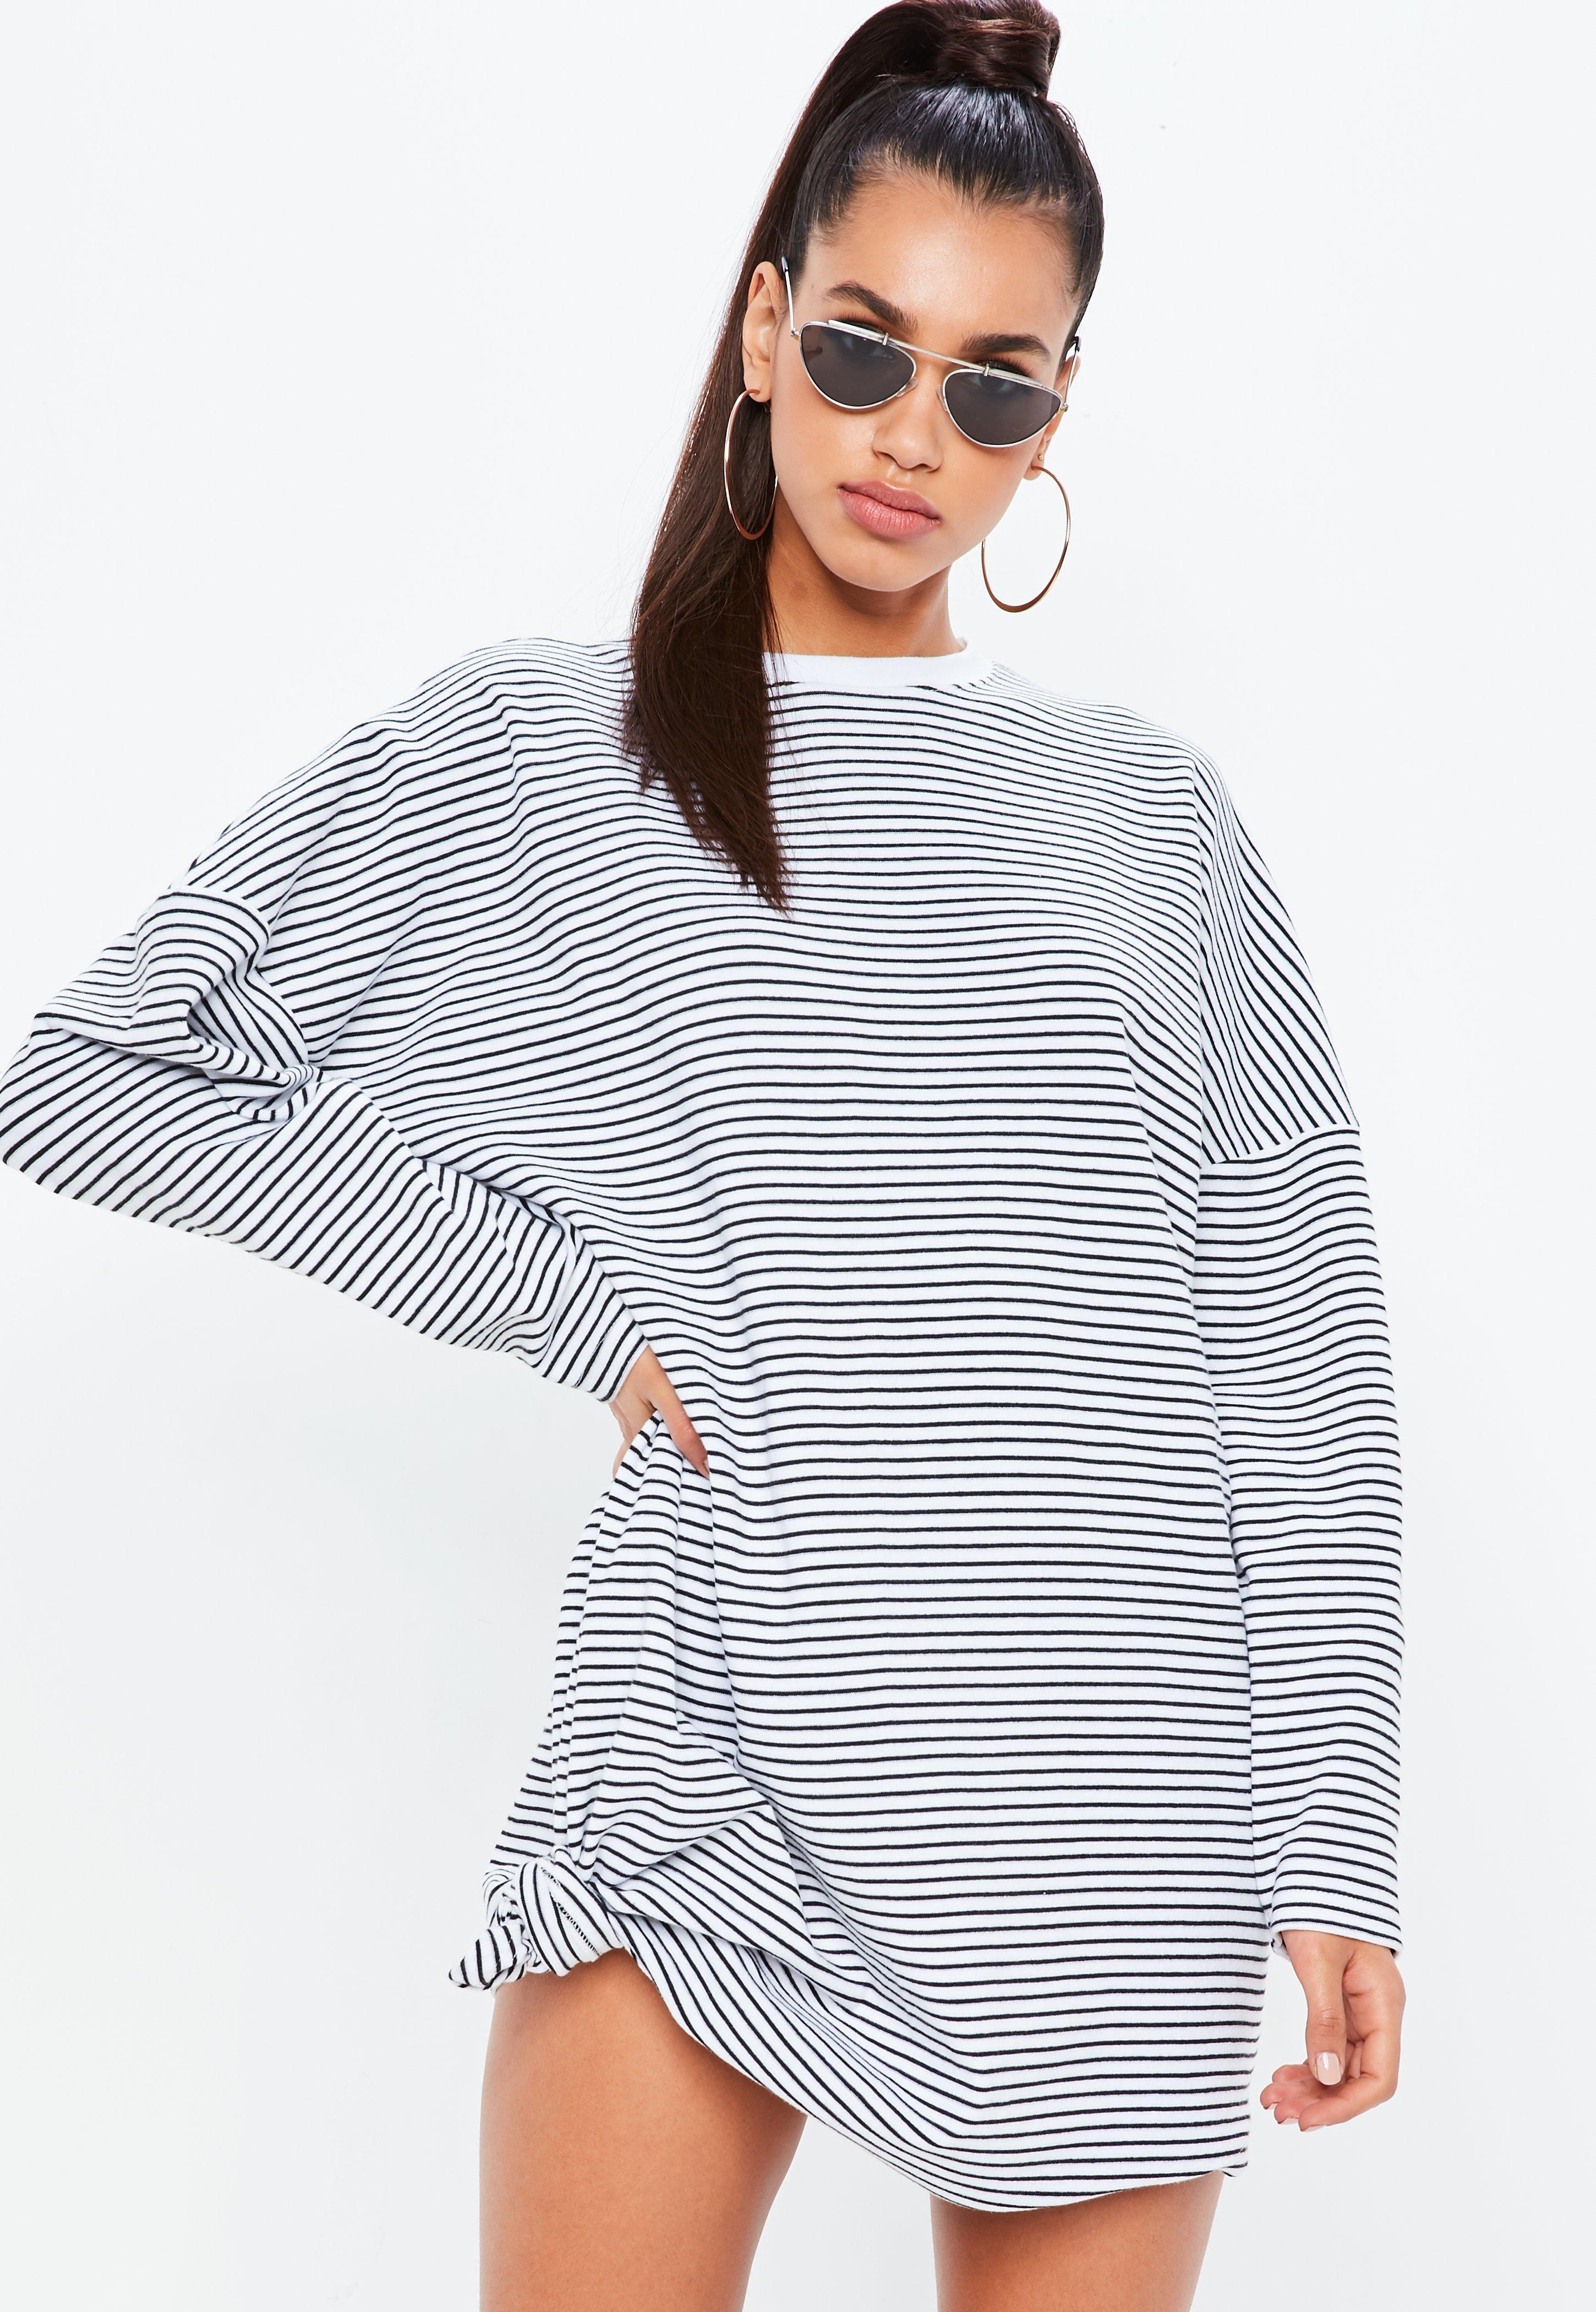 80c4209b5e7 Missguided White Oversized Stripe Sweatshirt Dress in White - Lyst